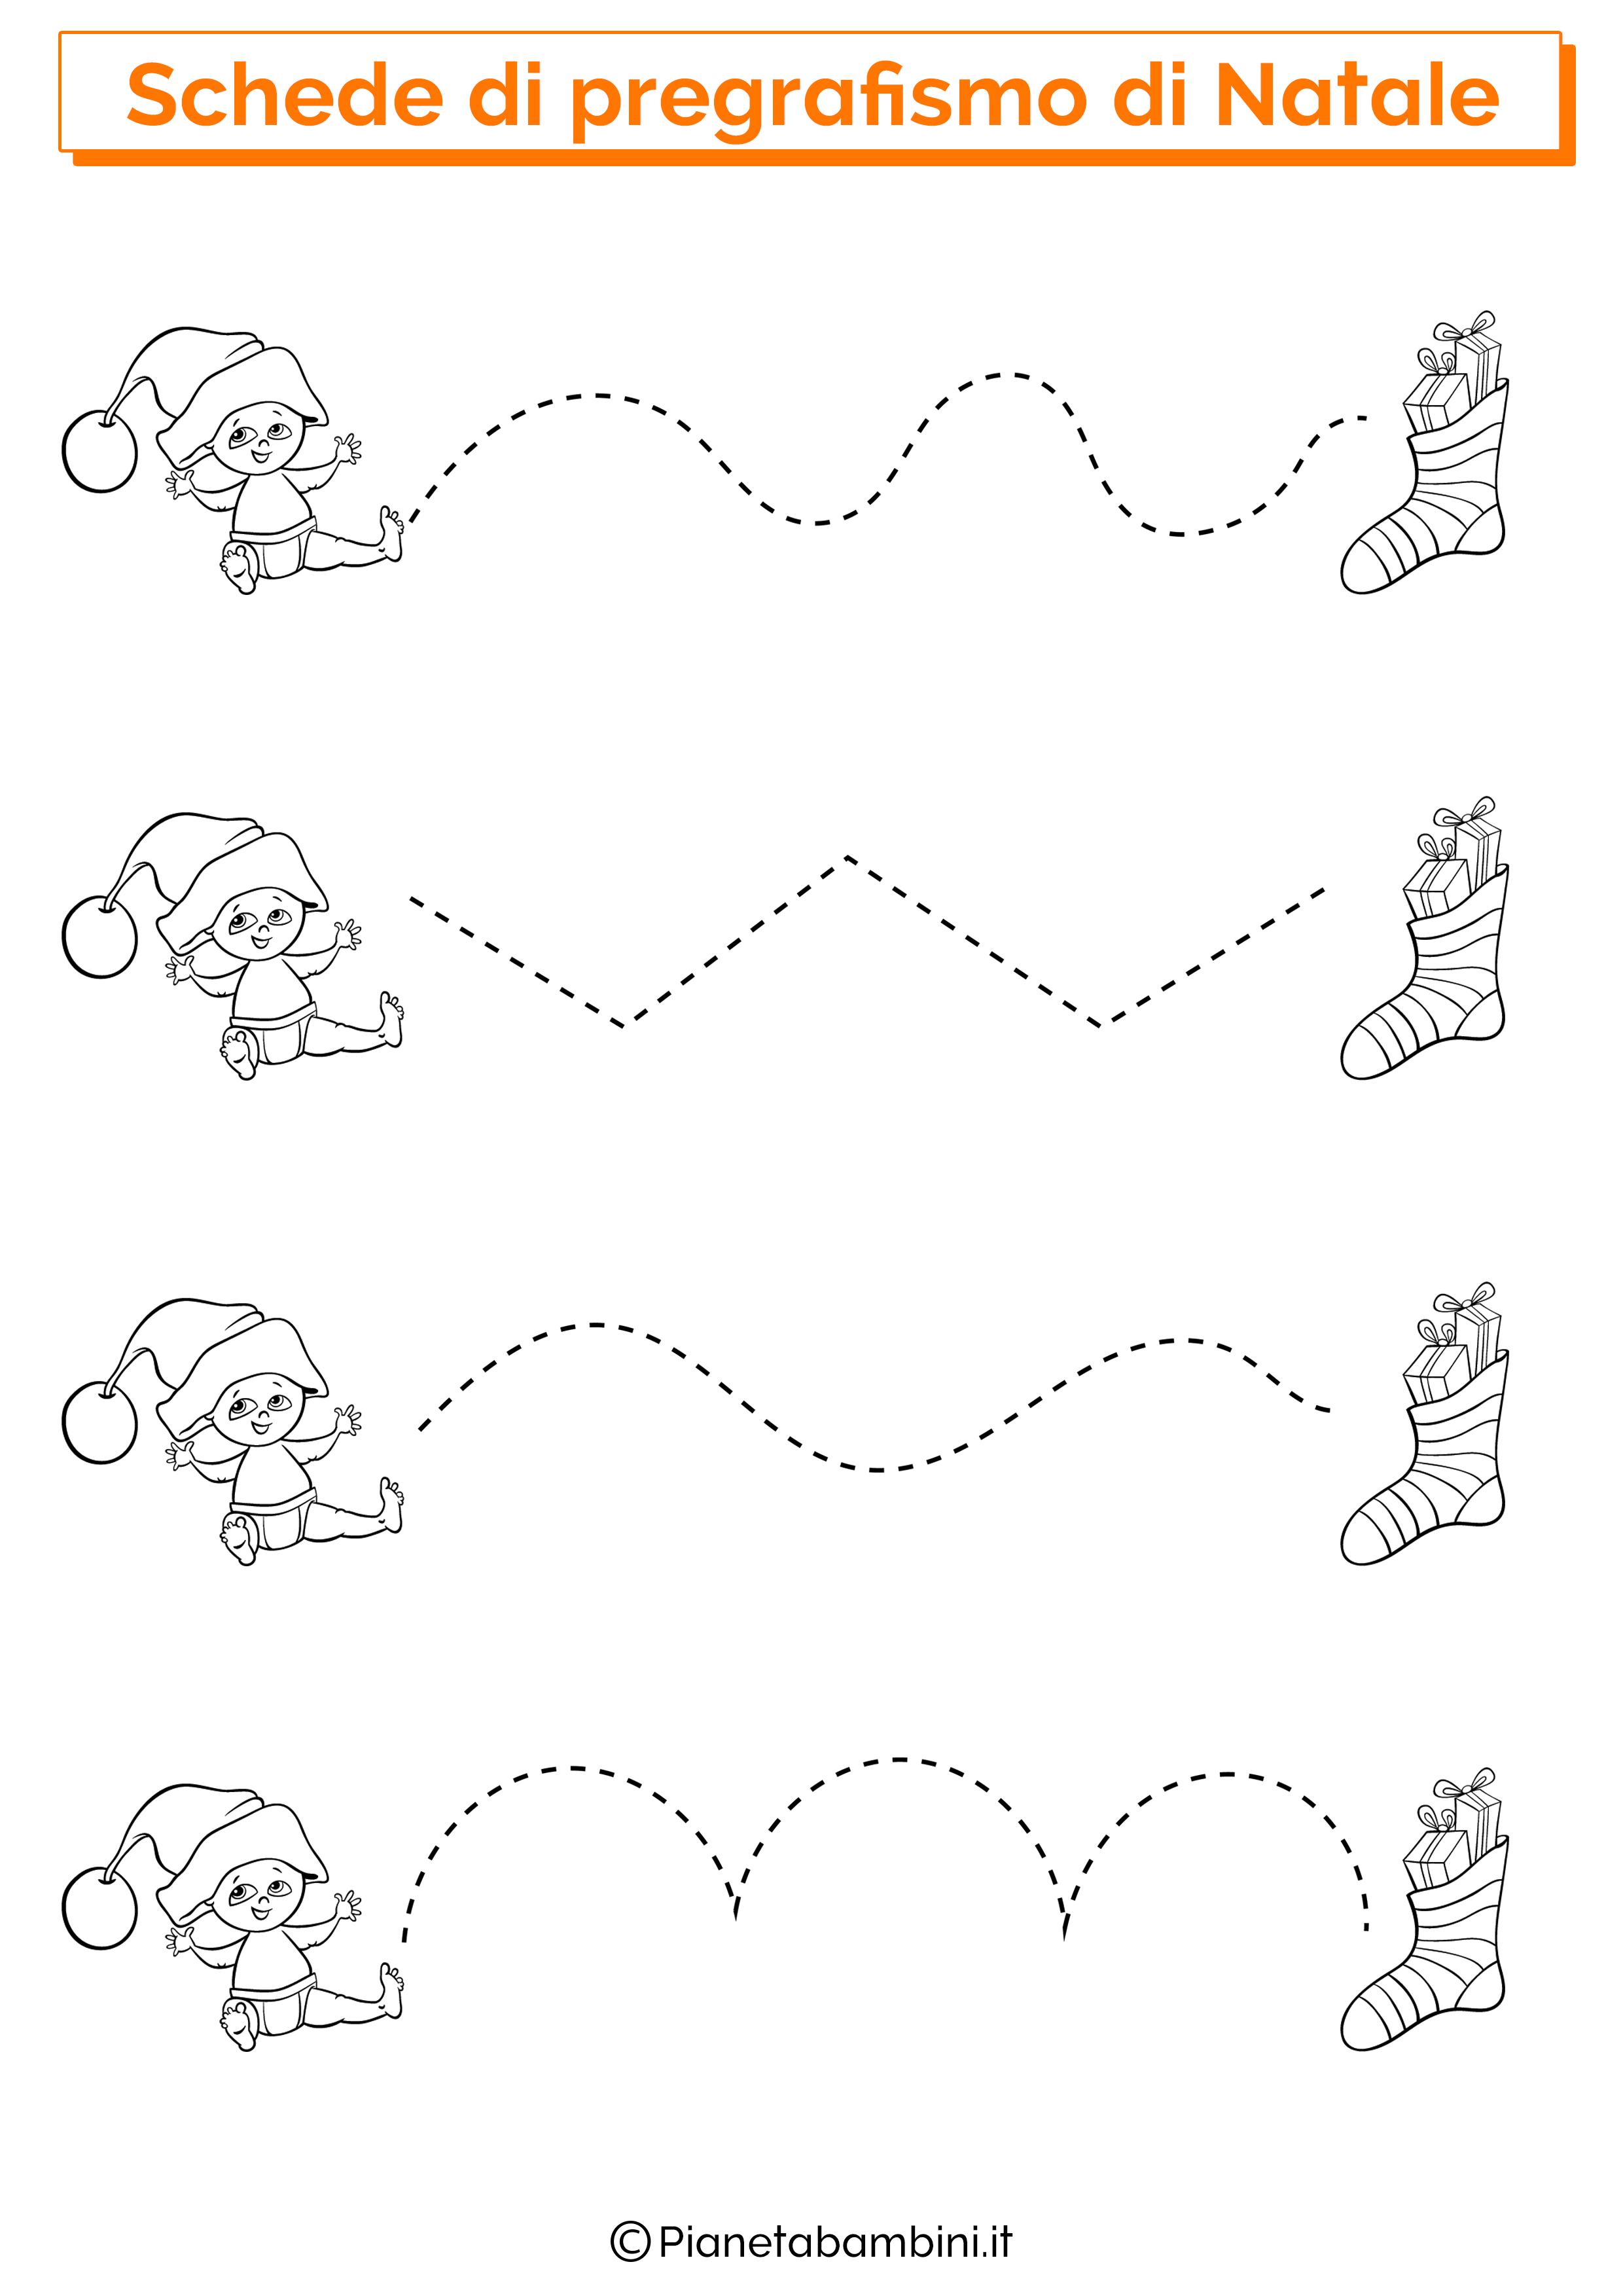 Schede pregrafismo linee Natale 03